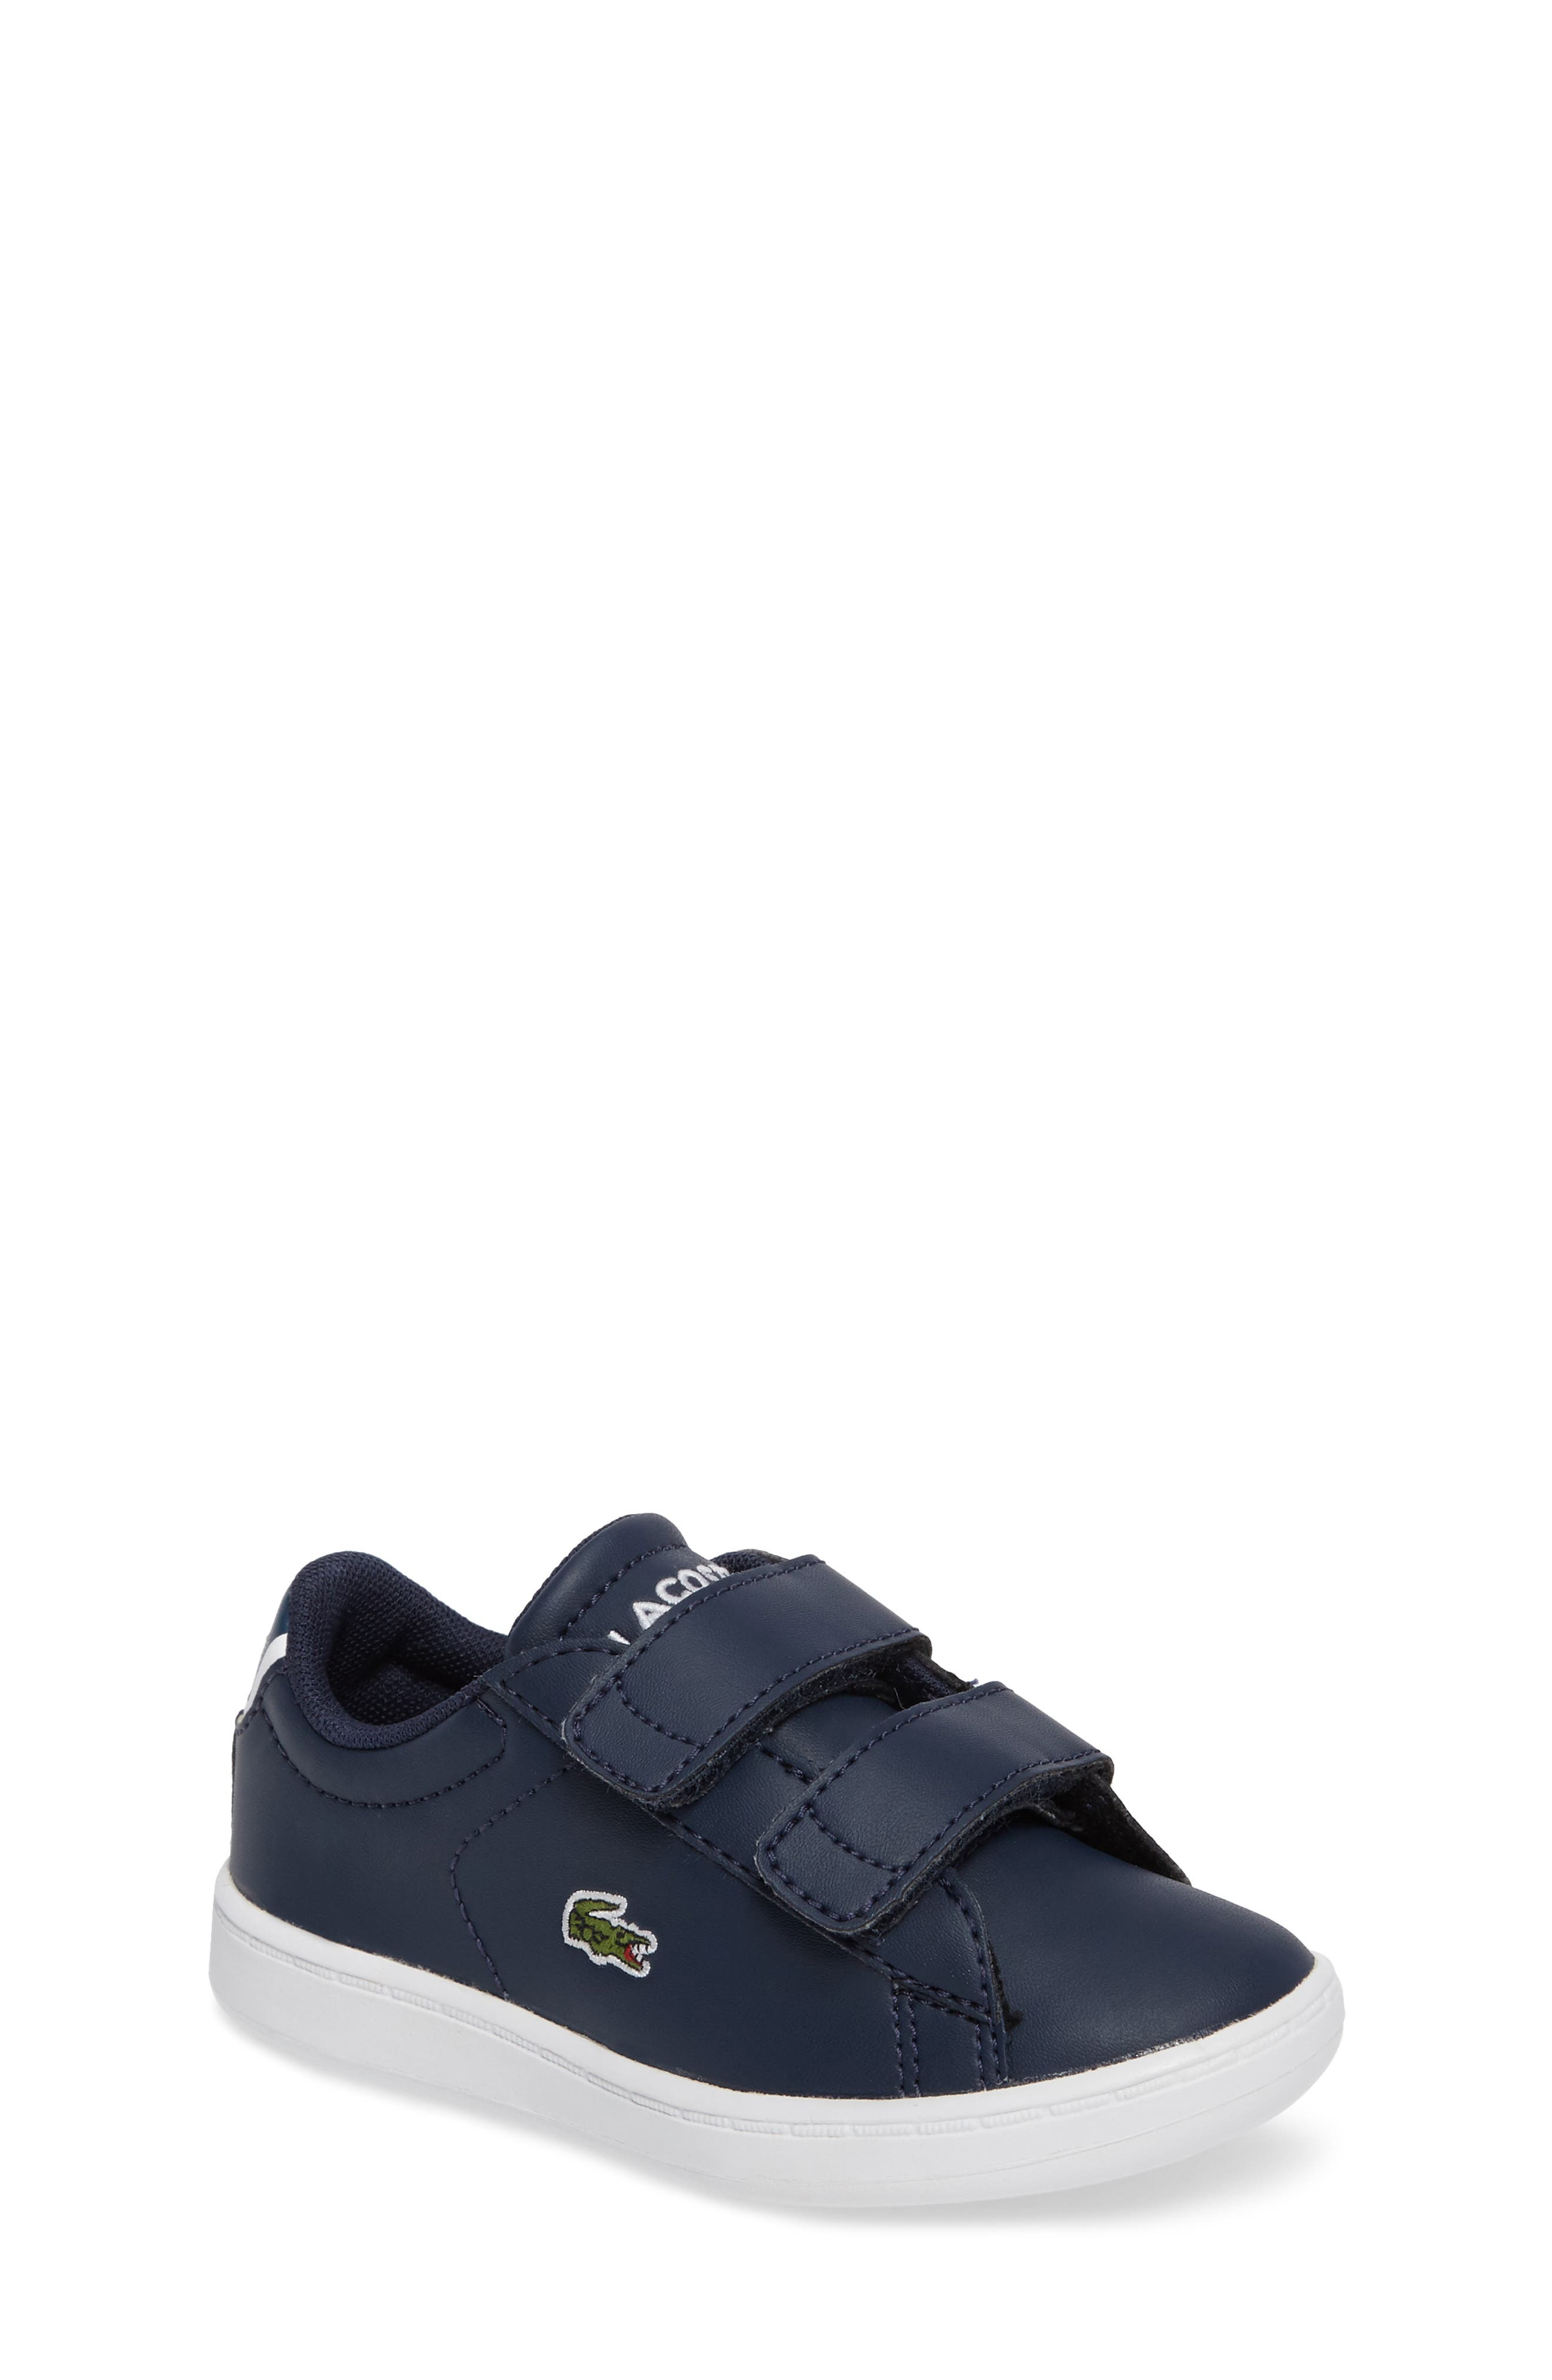 Main Image - Lacoste Carnaby Evo Sneaker (Baby, Walker, Toddler & Little Kid)